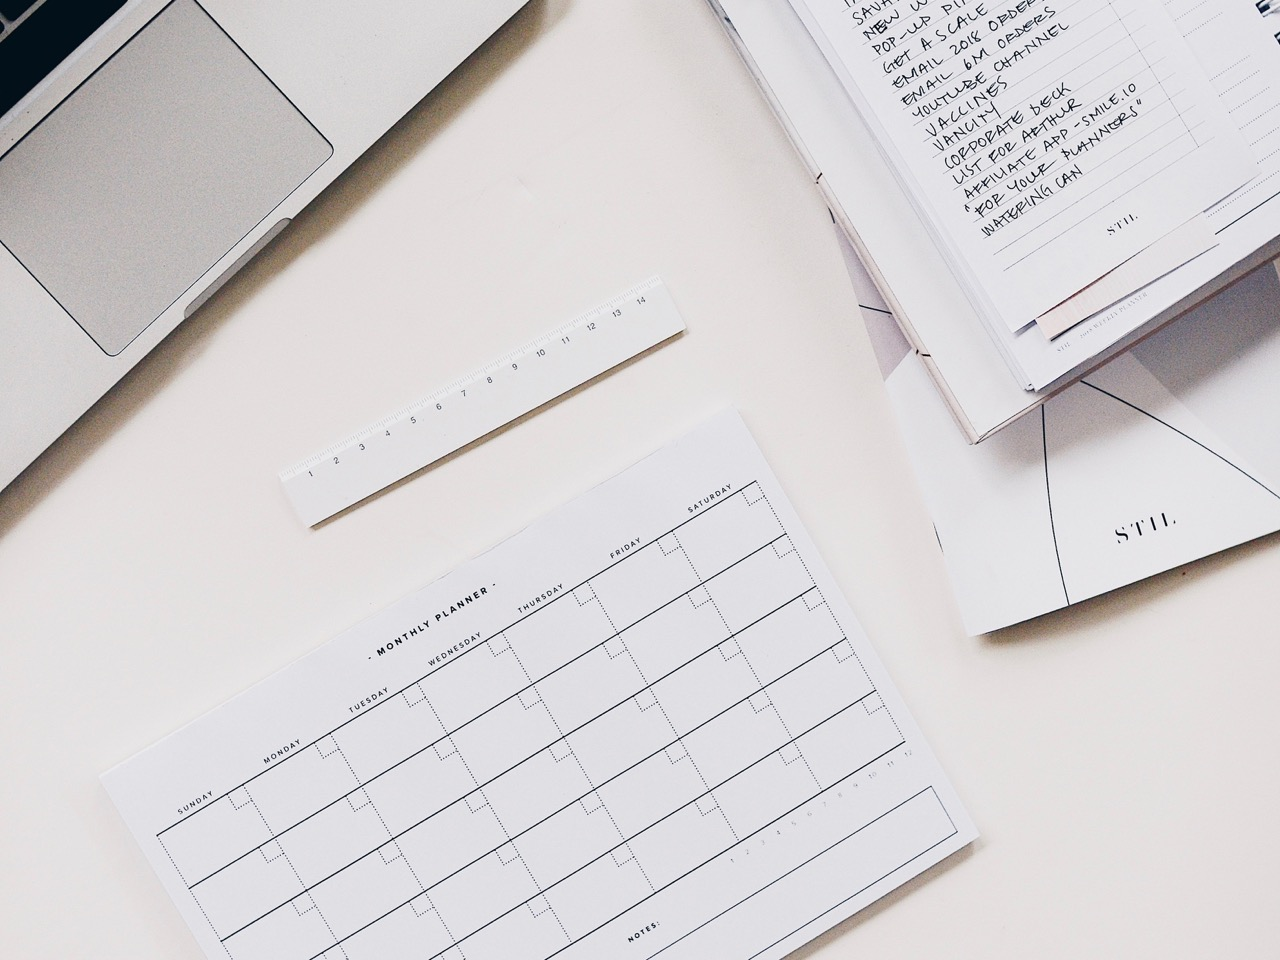 Be More Productive: Batch Tasks